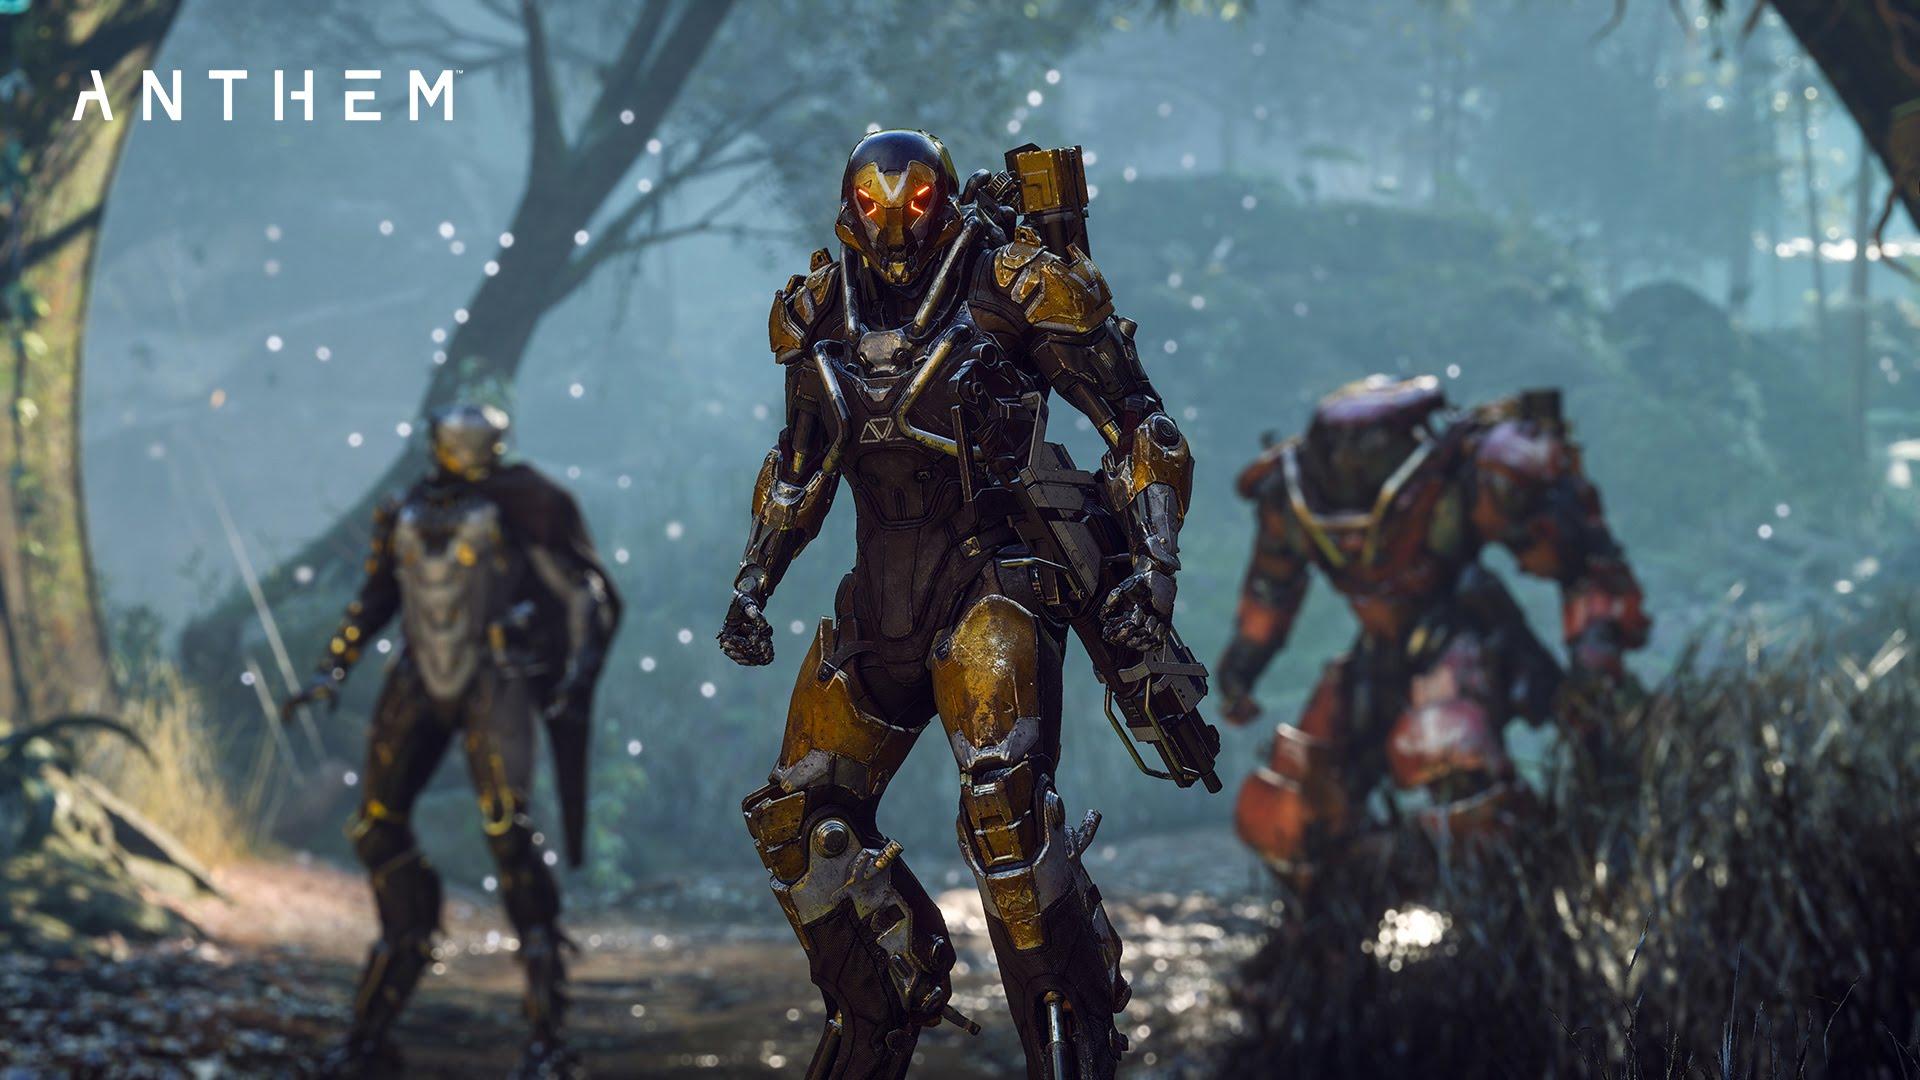 Electronic Arts Anthem résultats